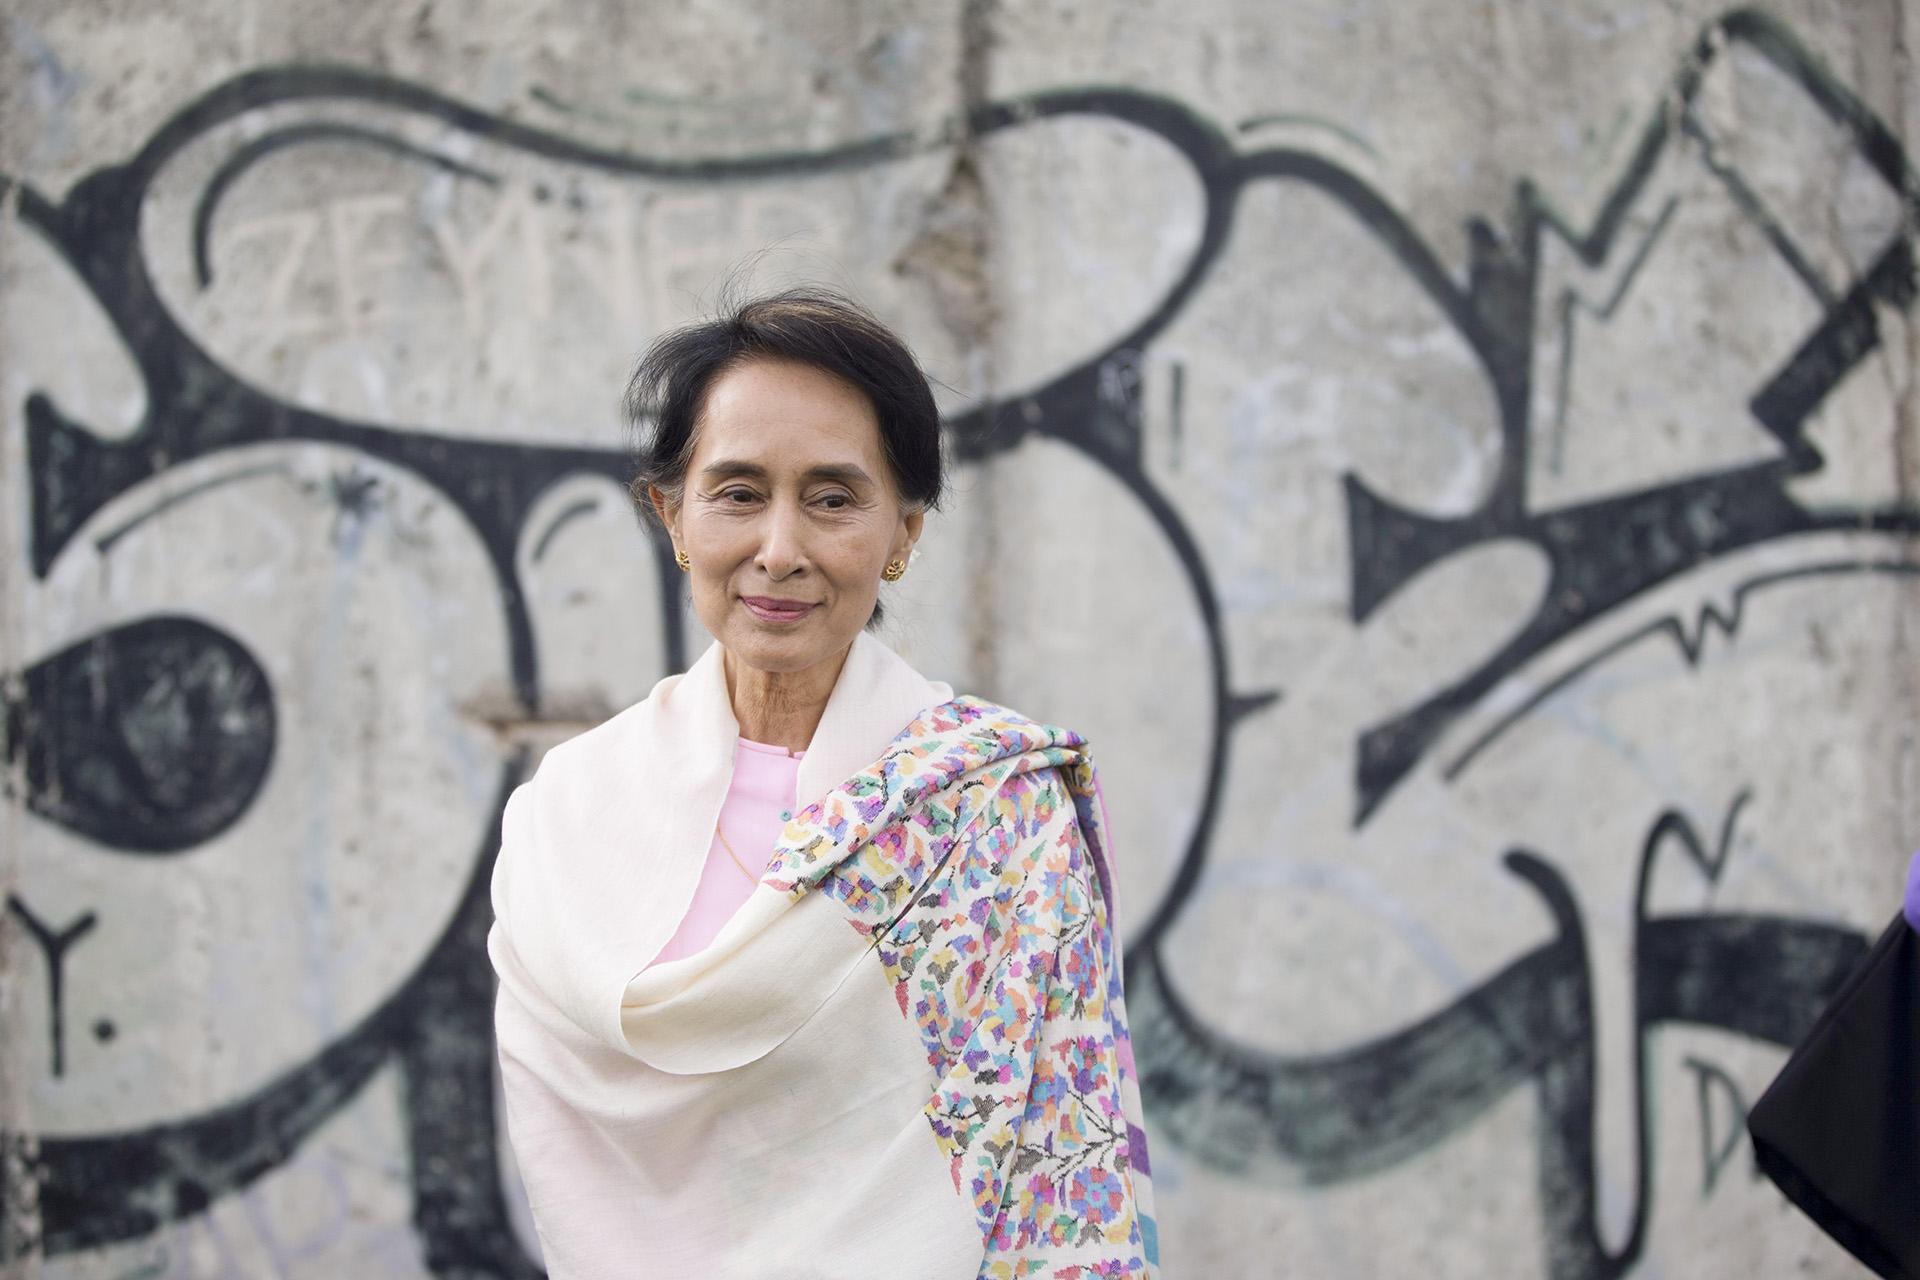 Aung San Suu Kyi, Politician